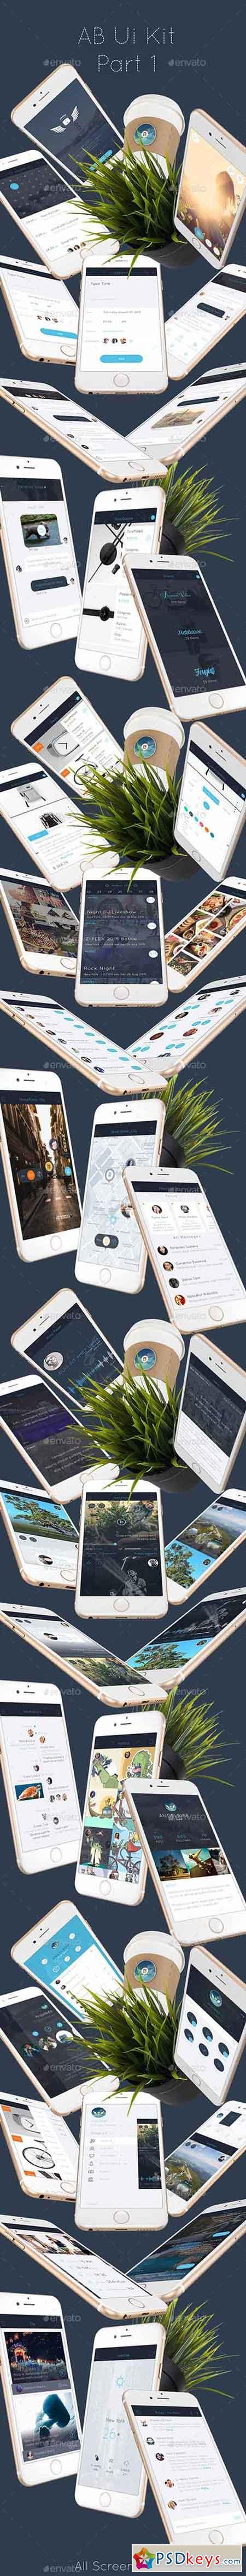 AB1 Mobile UI Kit 12432630